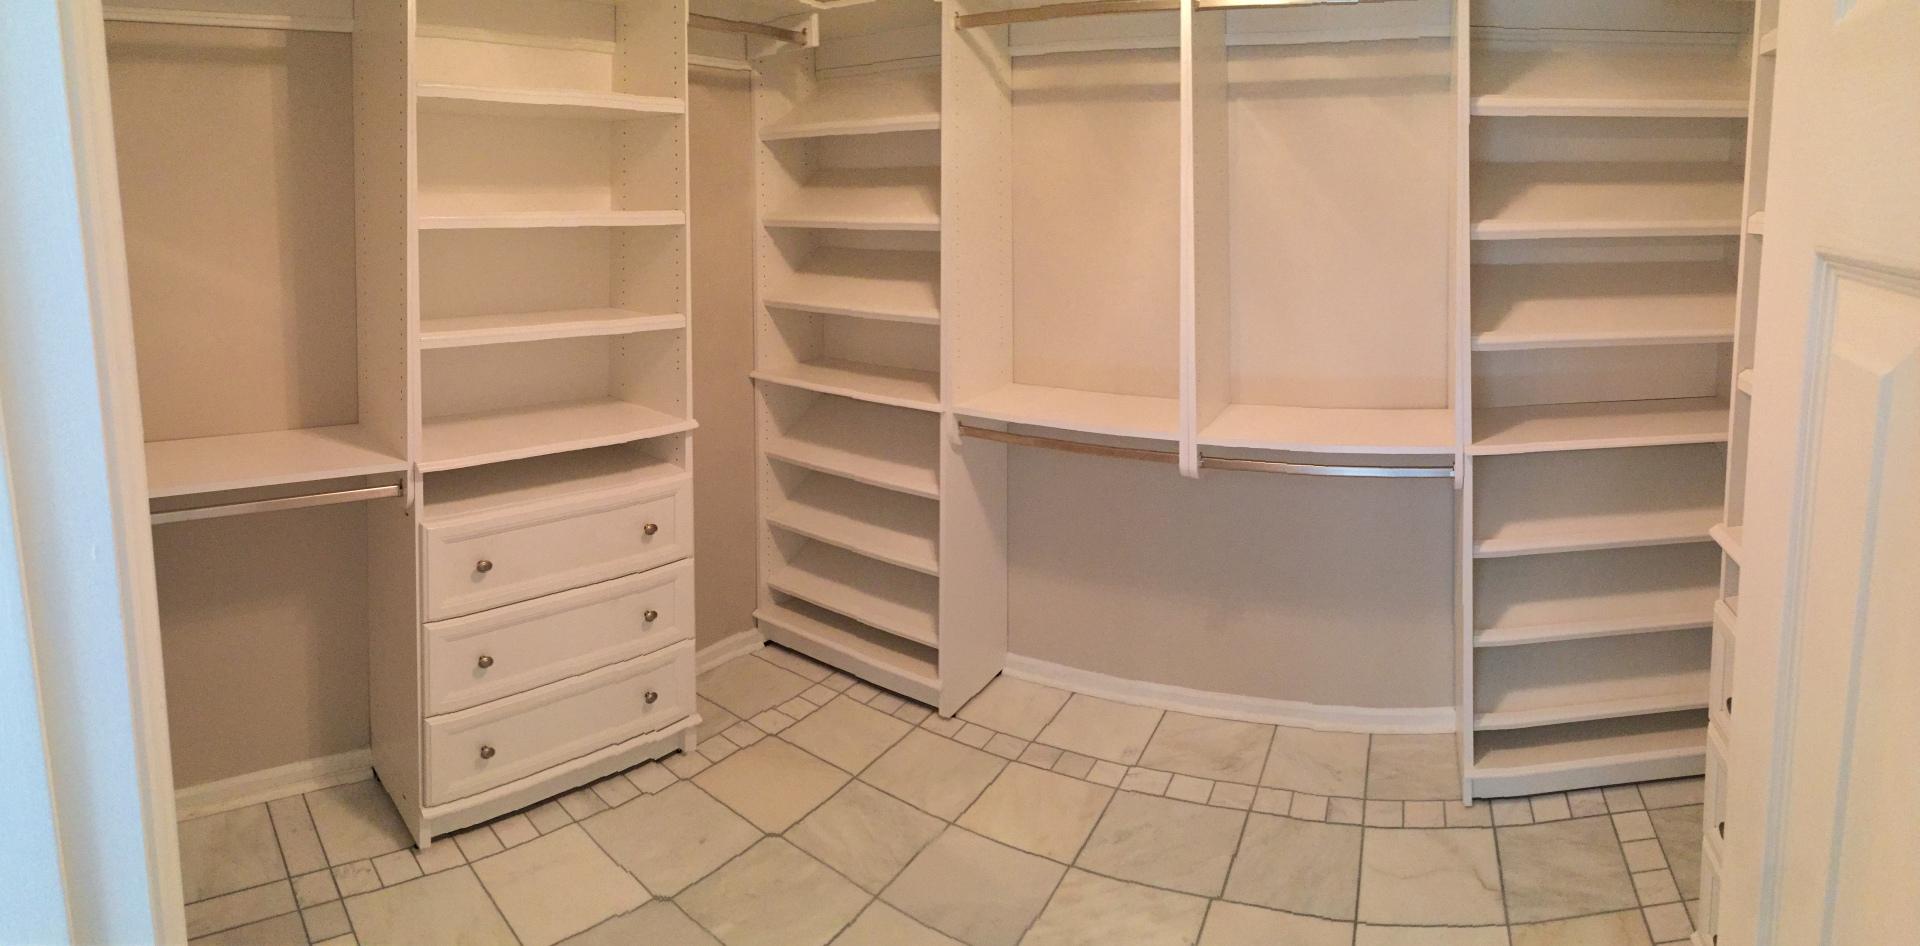 closet, remodel, organize closet, shelves, poles, drawers, help, fix my closet, braselton, georgia, atlanta, oakwood, chateau élan, handyman,